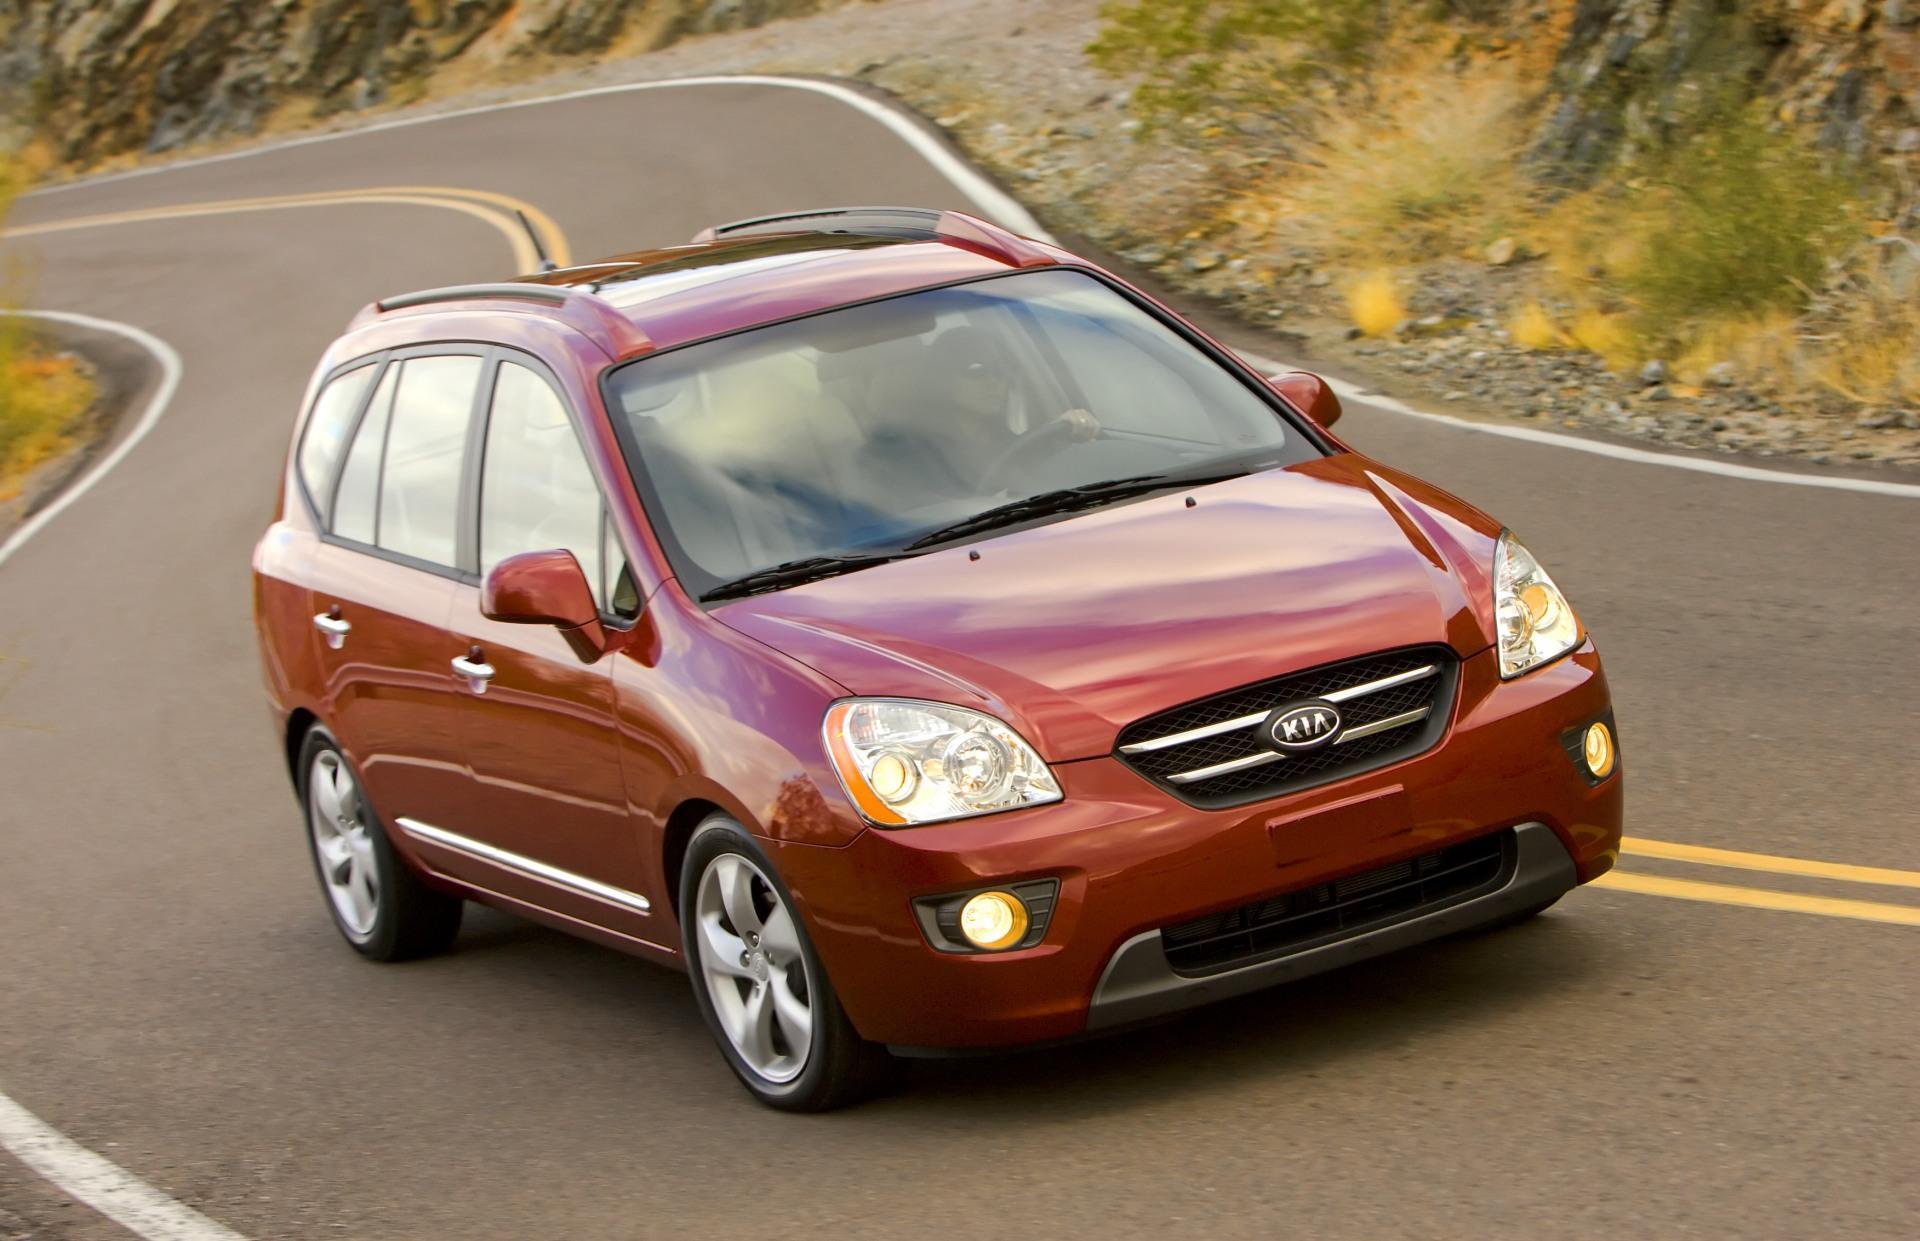 Dodge Models List >> 2010 Kia Rondo News and Information - conceptcarz.com